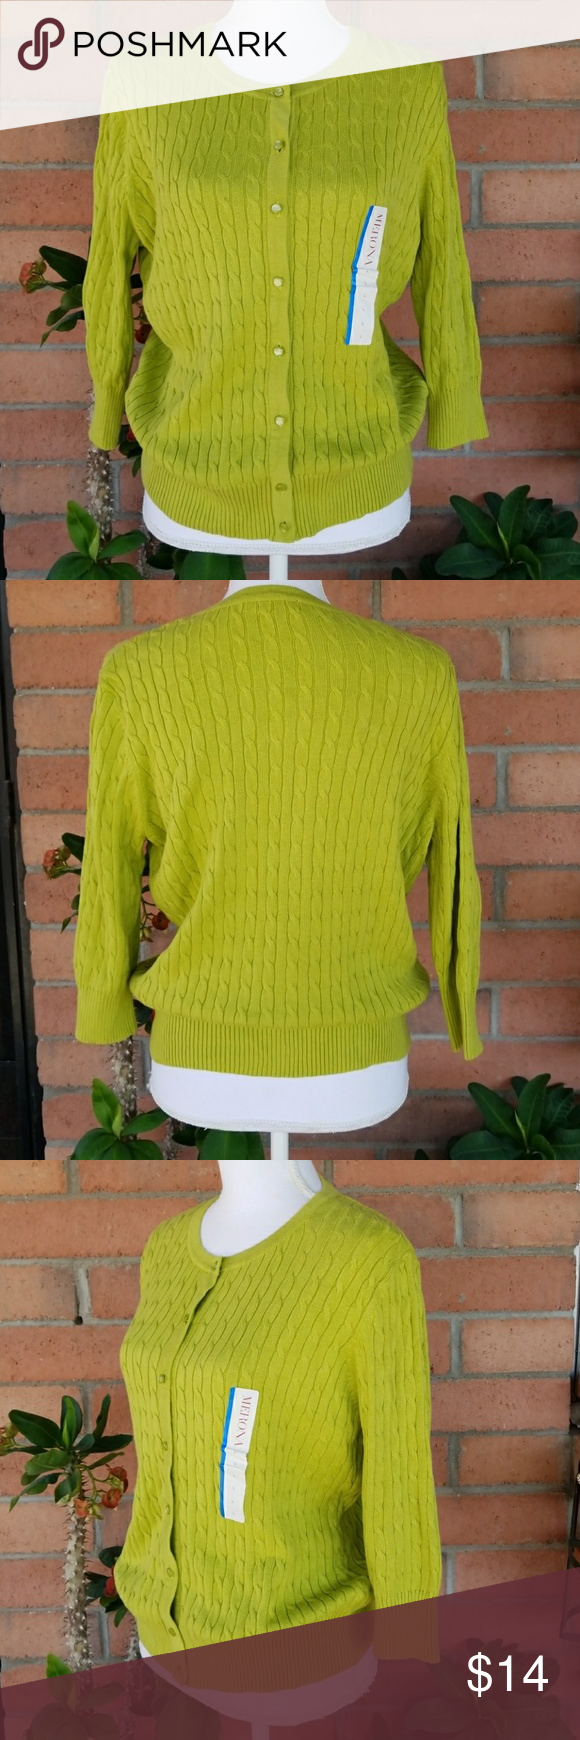 Merona | Lime Green Cardigan Sweater 3/4 Sleeves NWT